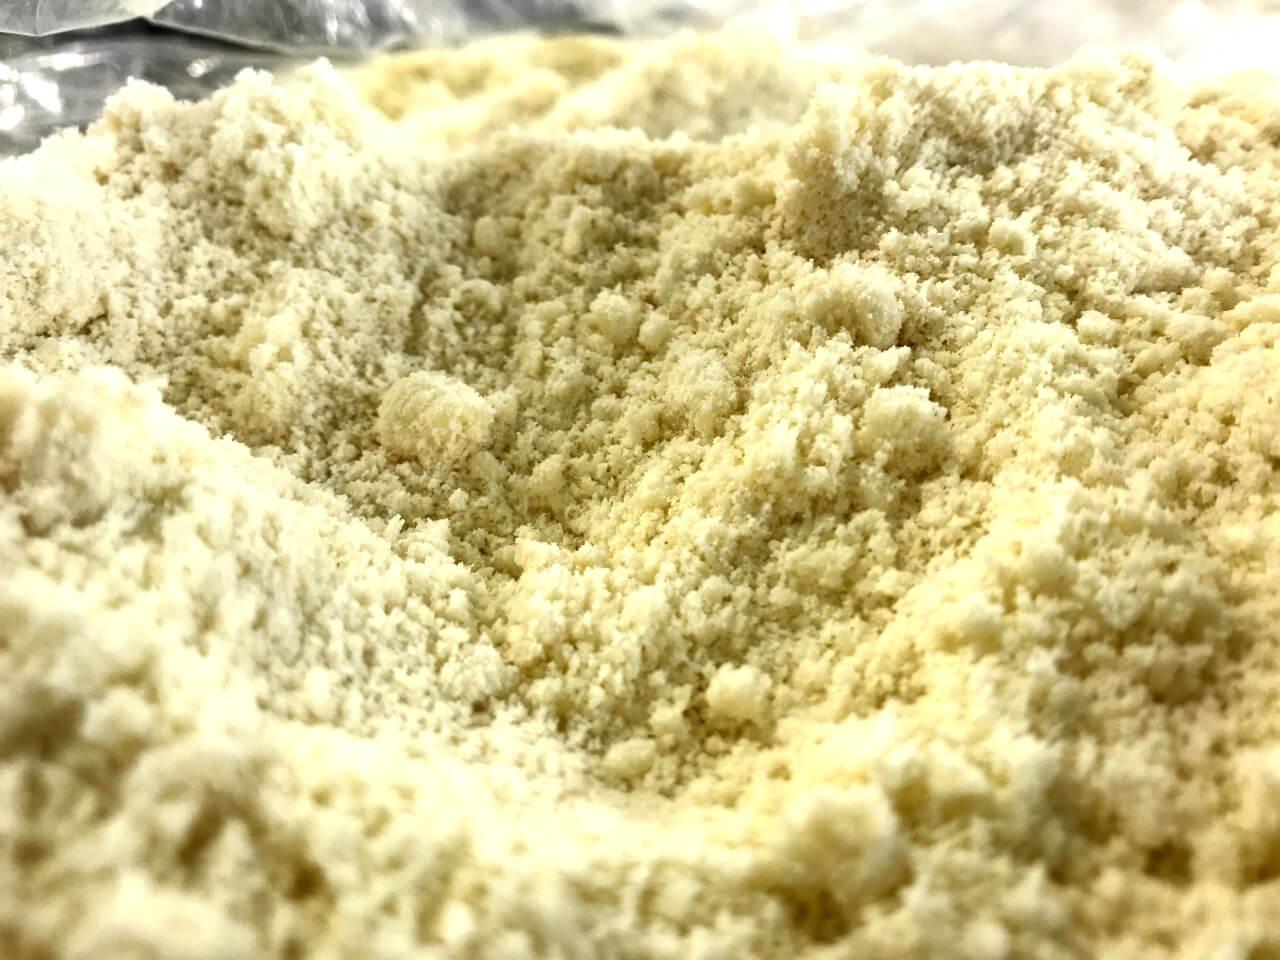 ramen noodle dough after mixing process